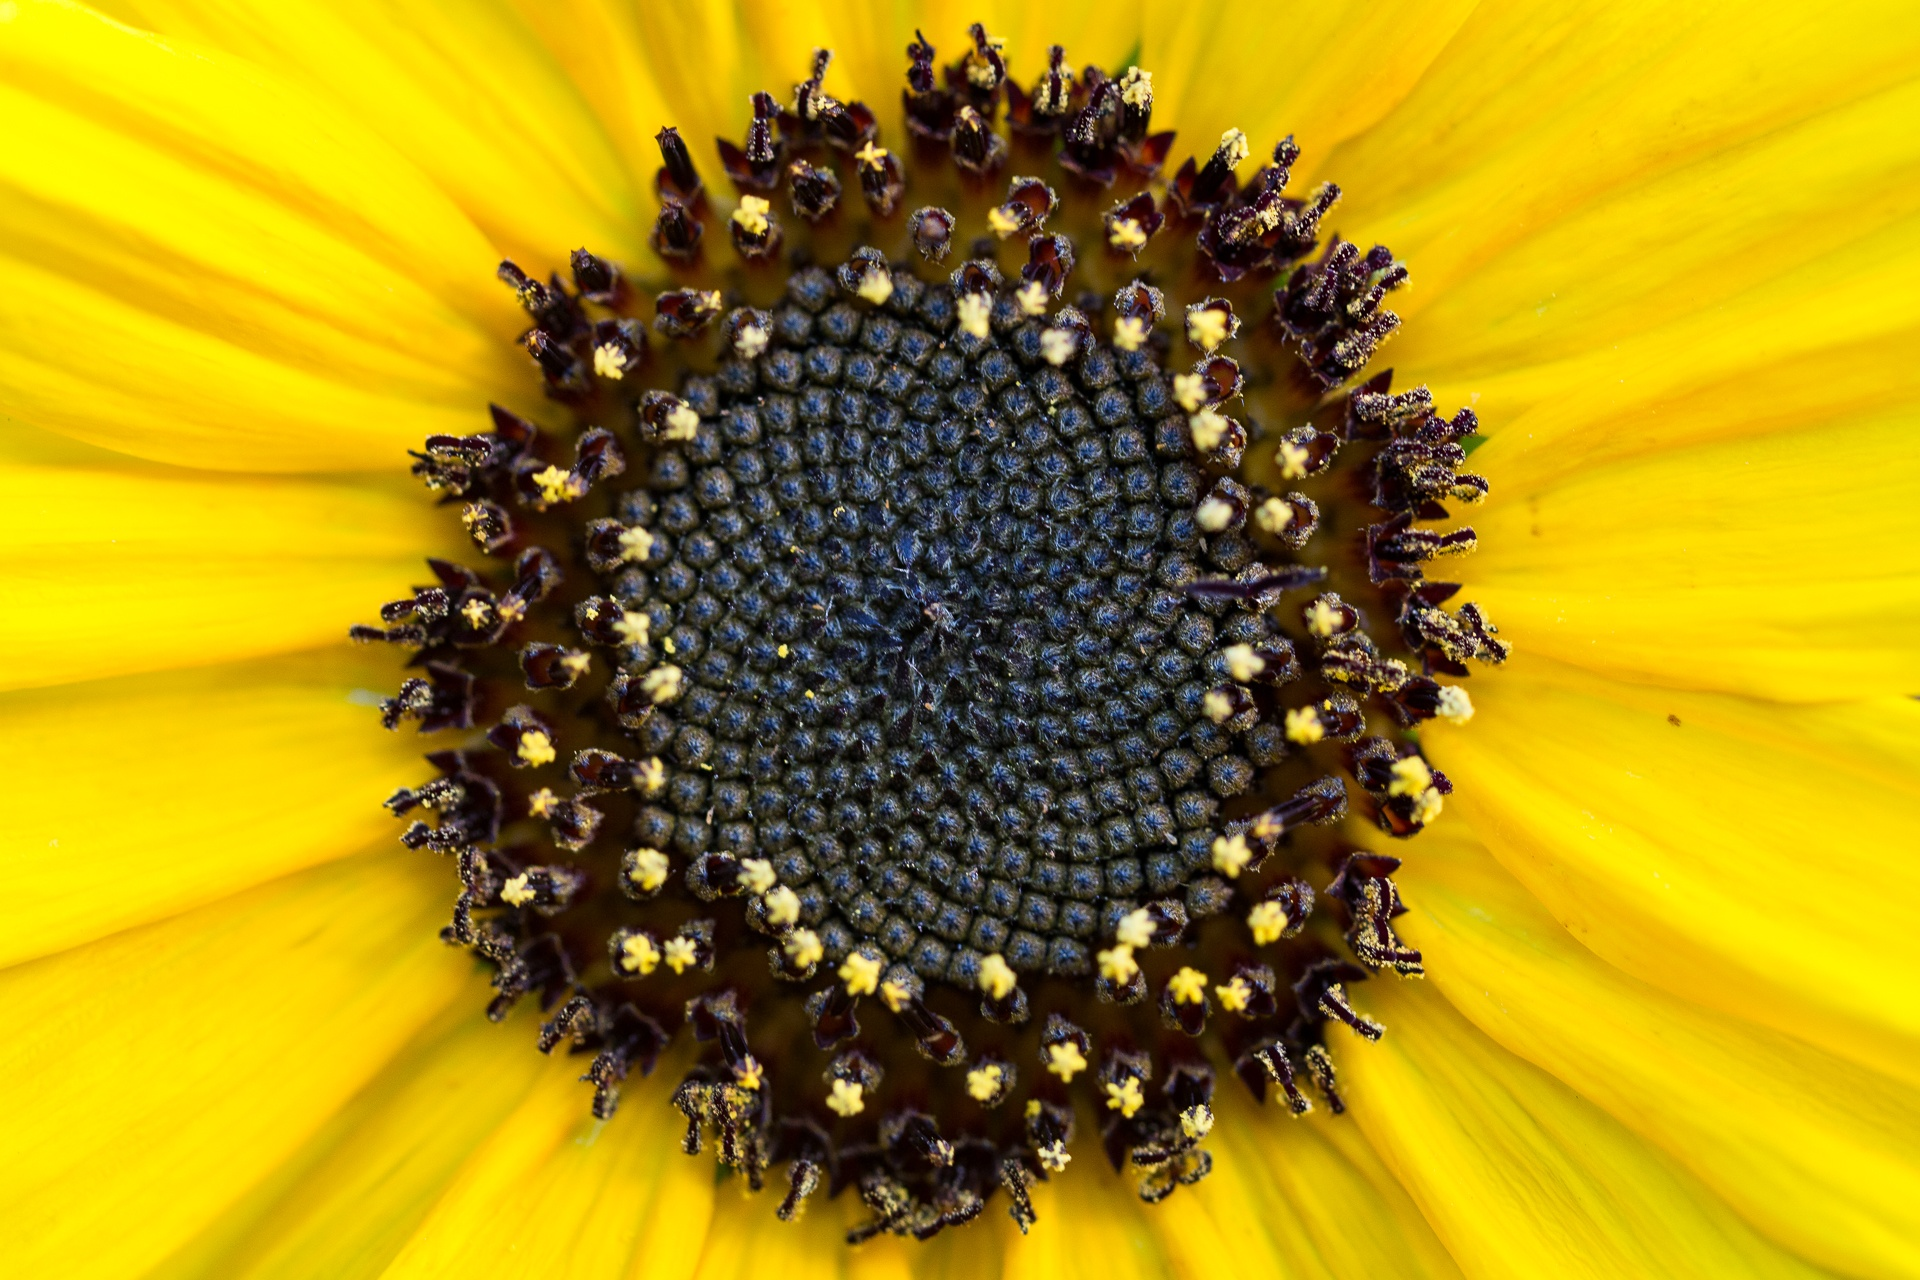 Centre of a sunflower close up